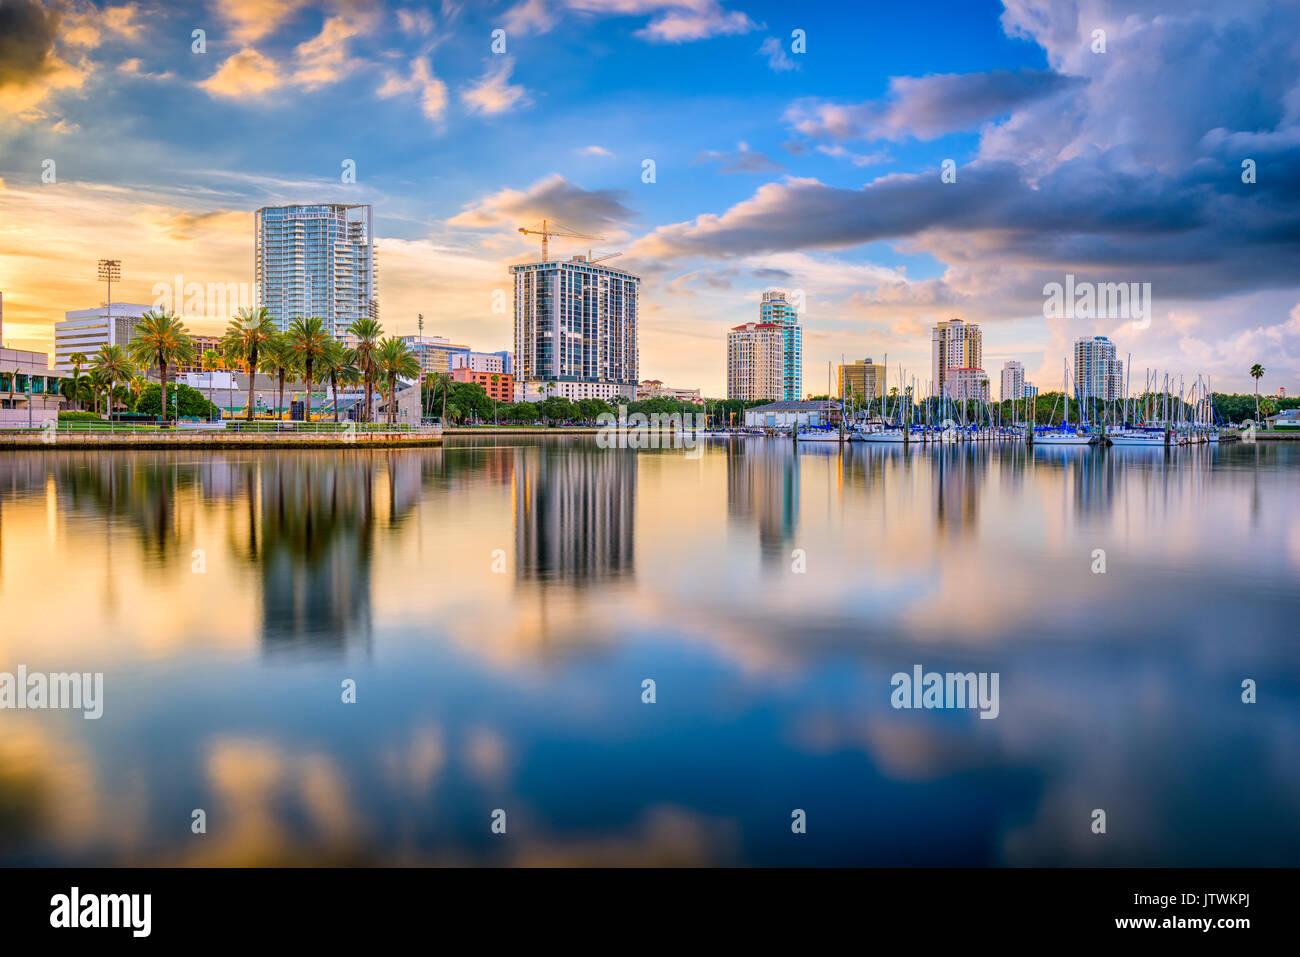 St. Petersburg, Florida, USA downtown city skyline on the bay. - Stock Image